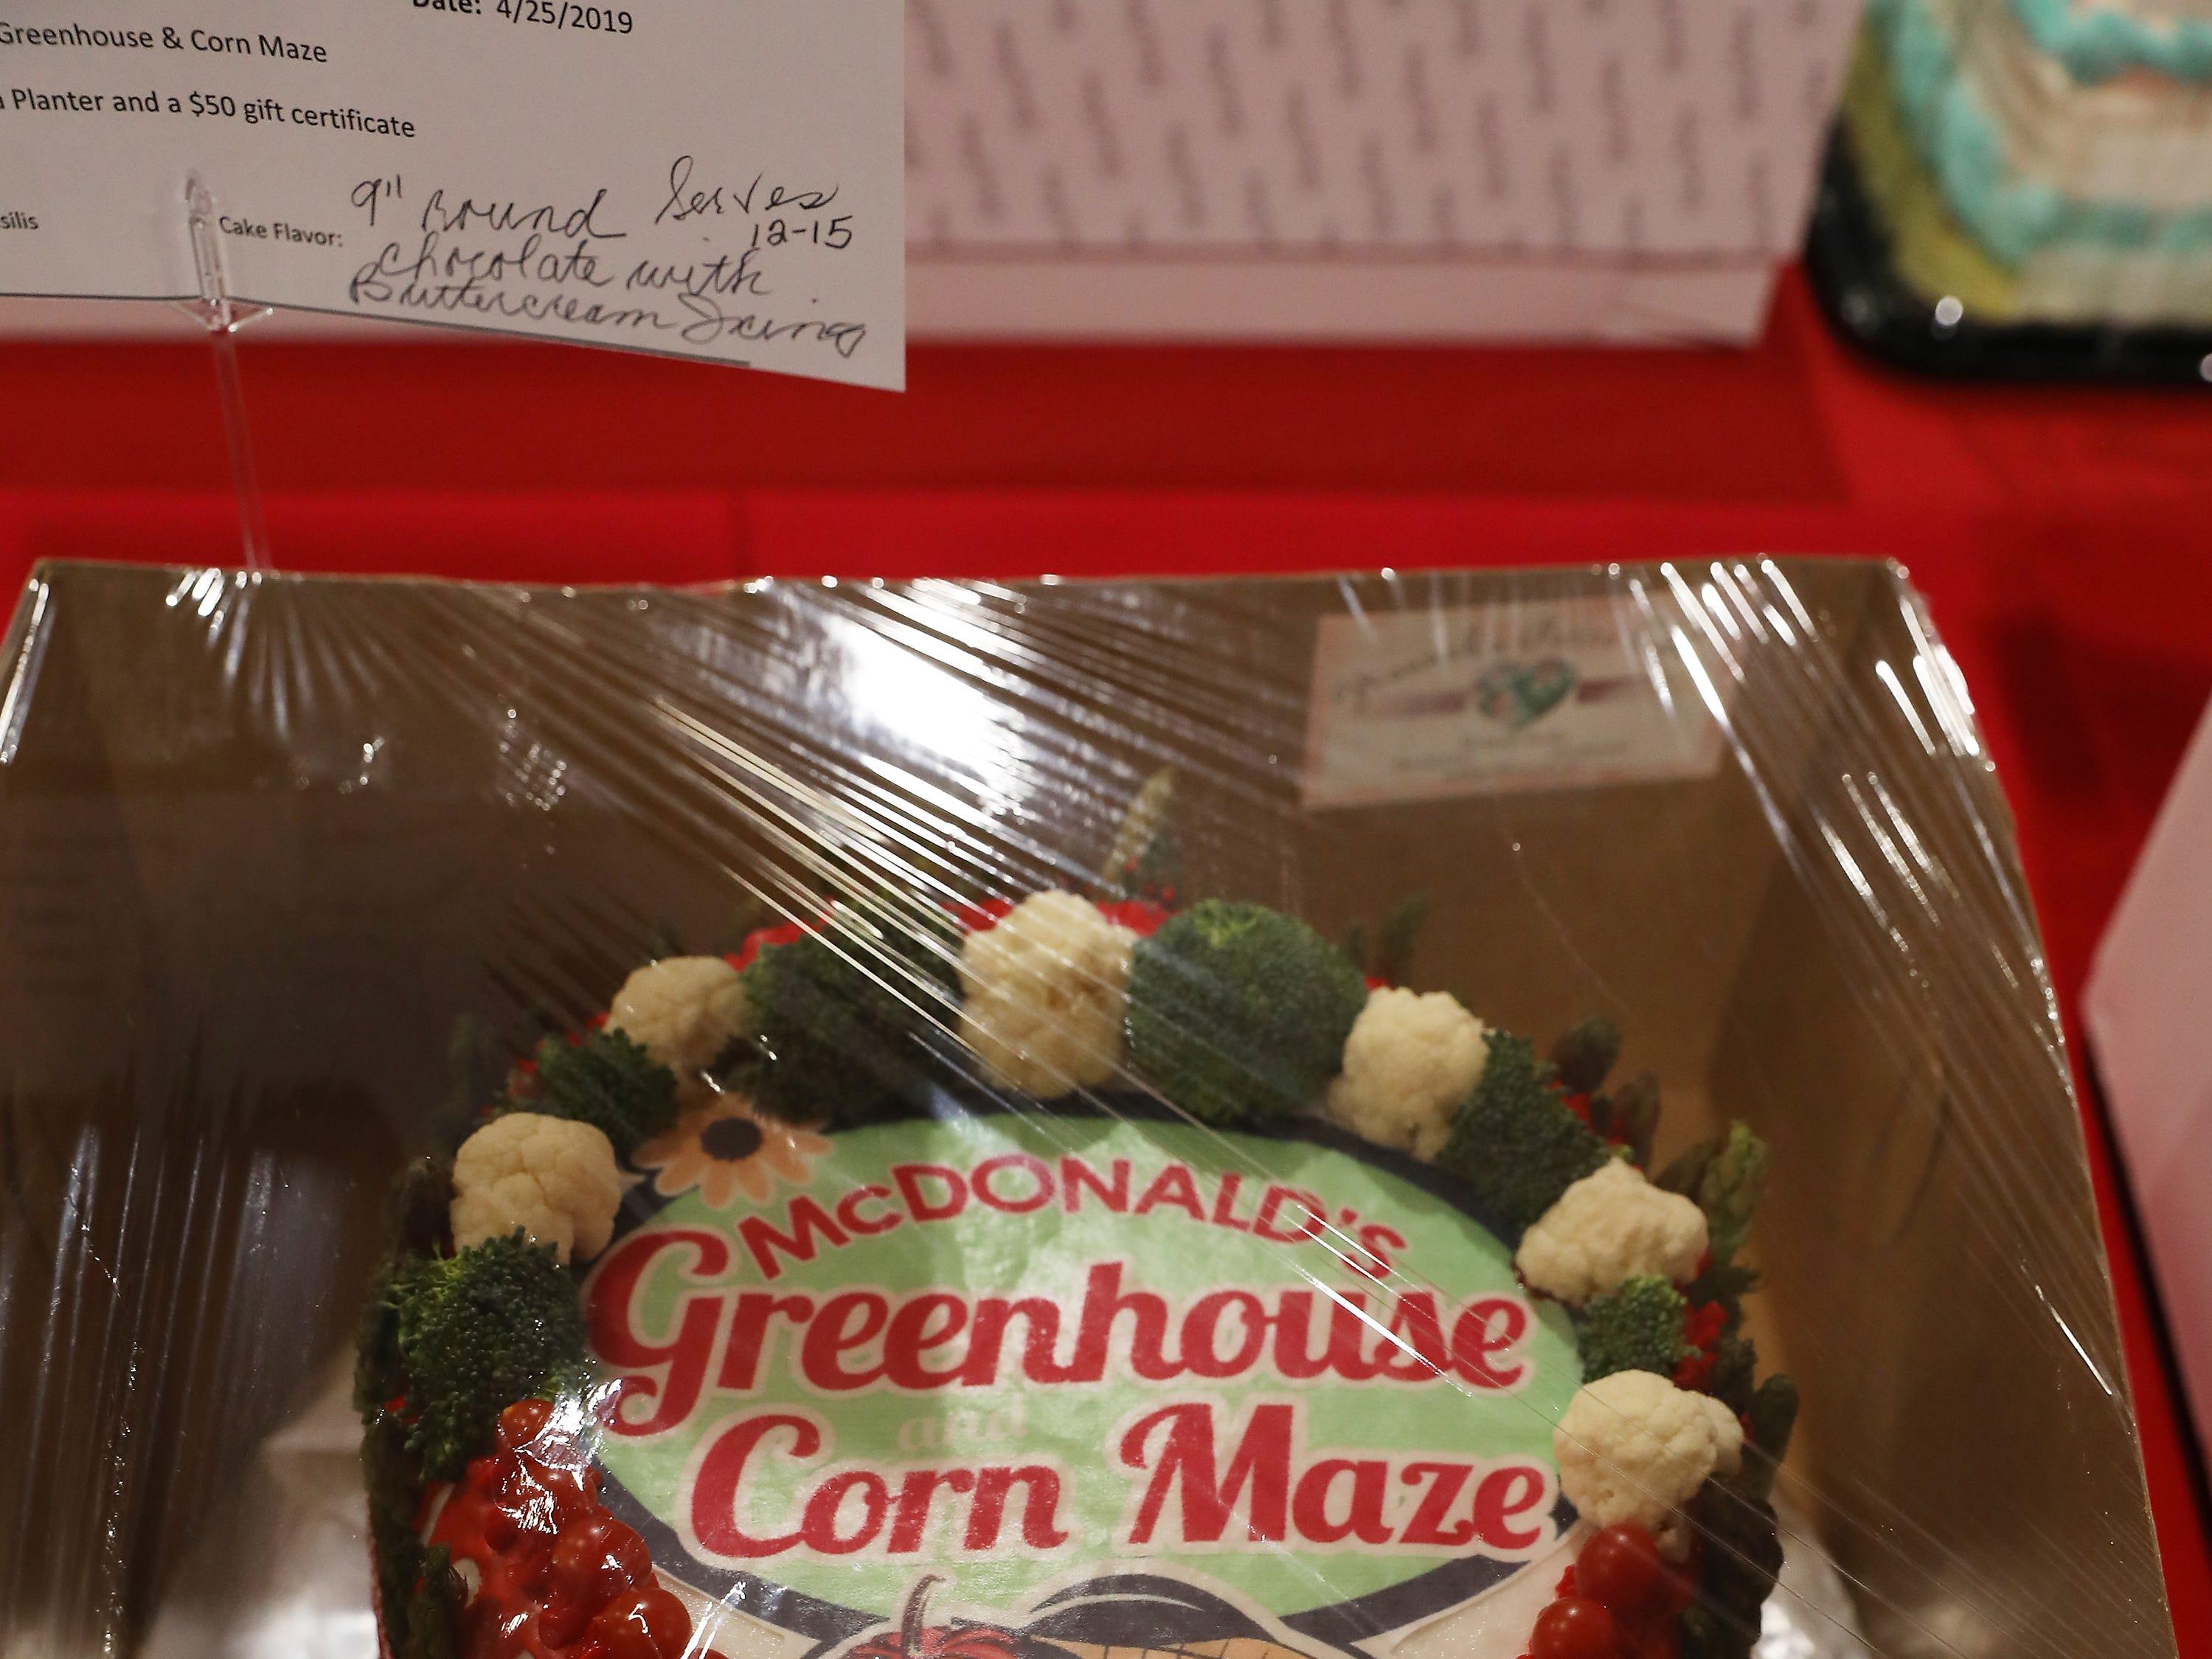 "2:15 P.M. Thursday cake 126 McDonald's Greenhouse & Corn Maze - 16"" salsa planter, $50 gift certificate"